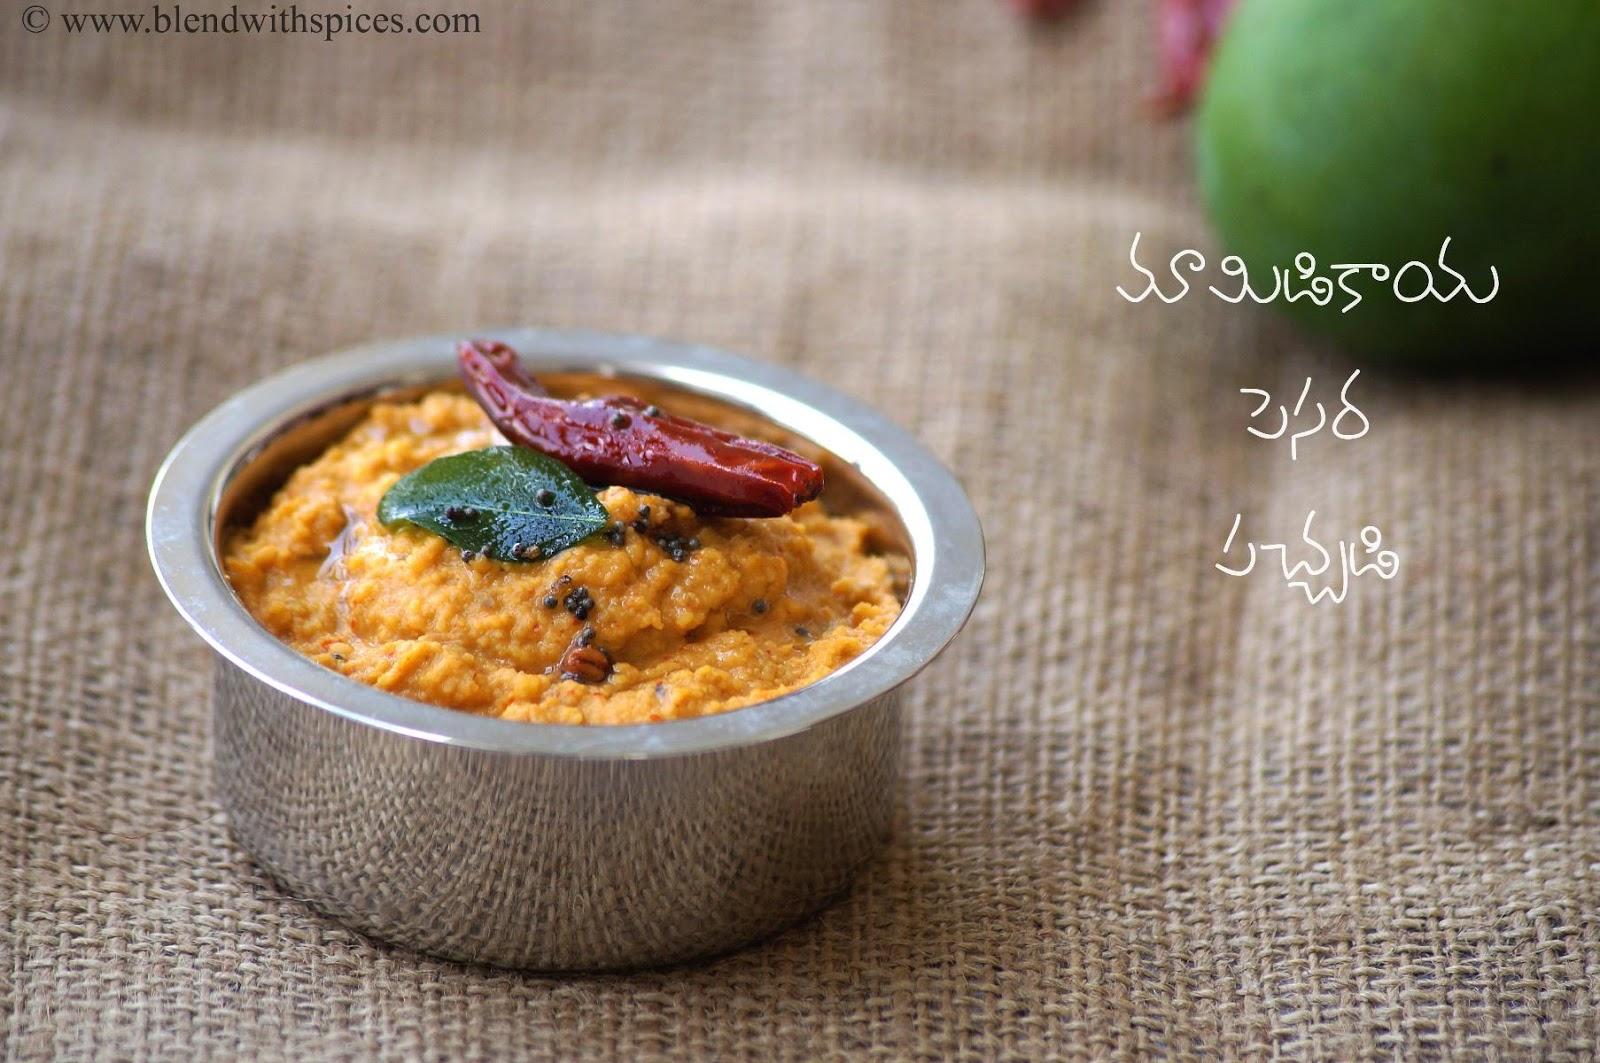 mamidikaya pesara pappu pachadi, andhra mango monng dal chutney, pesarapappu mango pachadi recipe, moong dal chutney for rice, chutney recipes, andhra pachadi recipe, chutney recipes